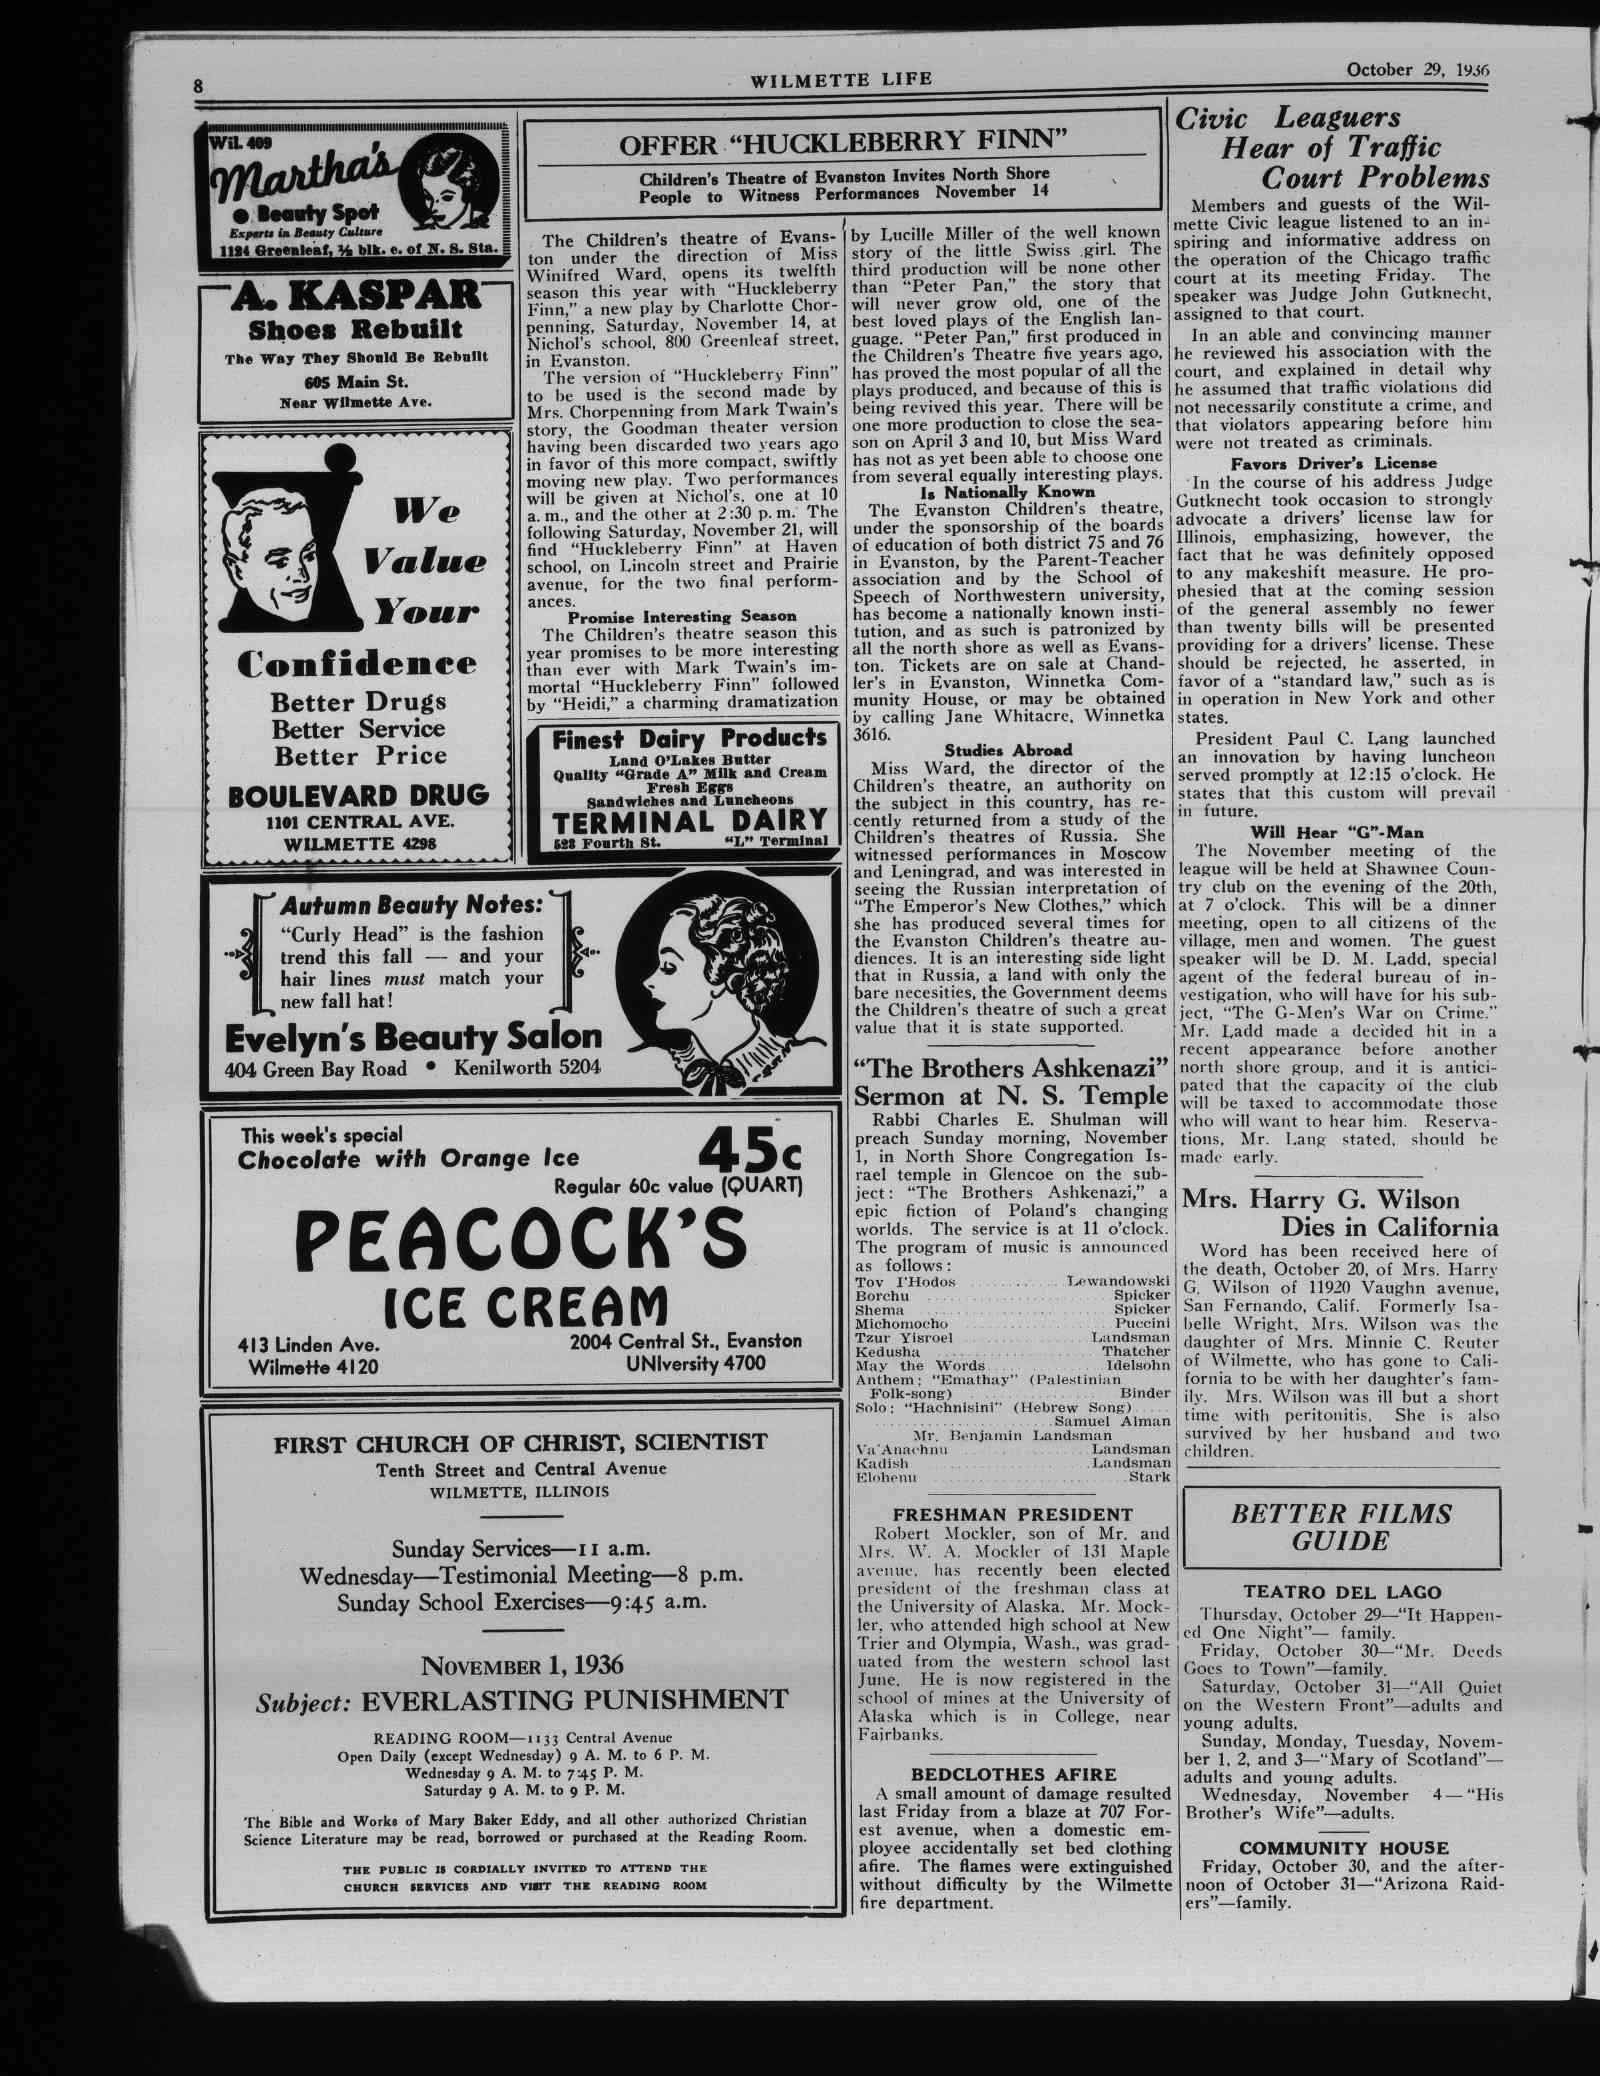 Wilmette Life (Wilmette, Illinois), 29 Oct 1936